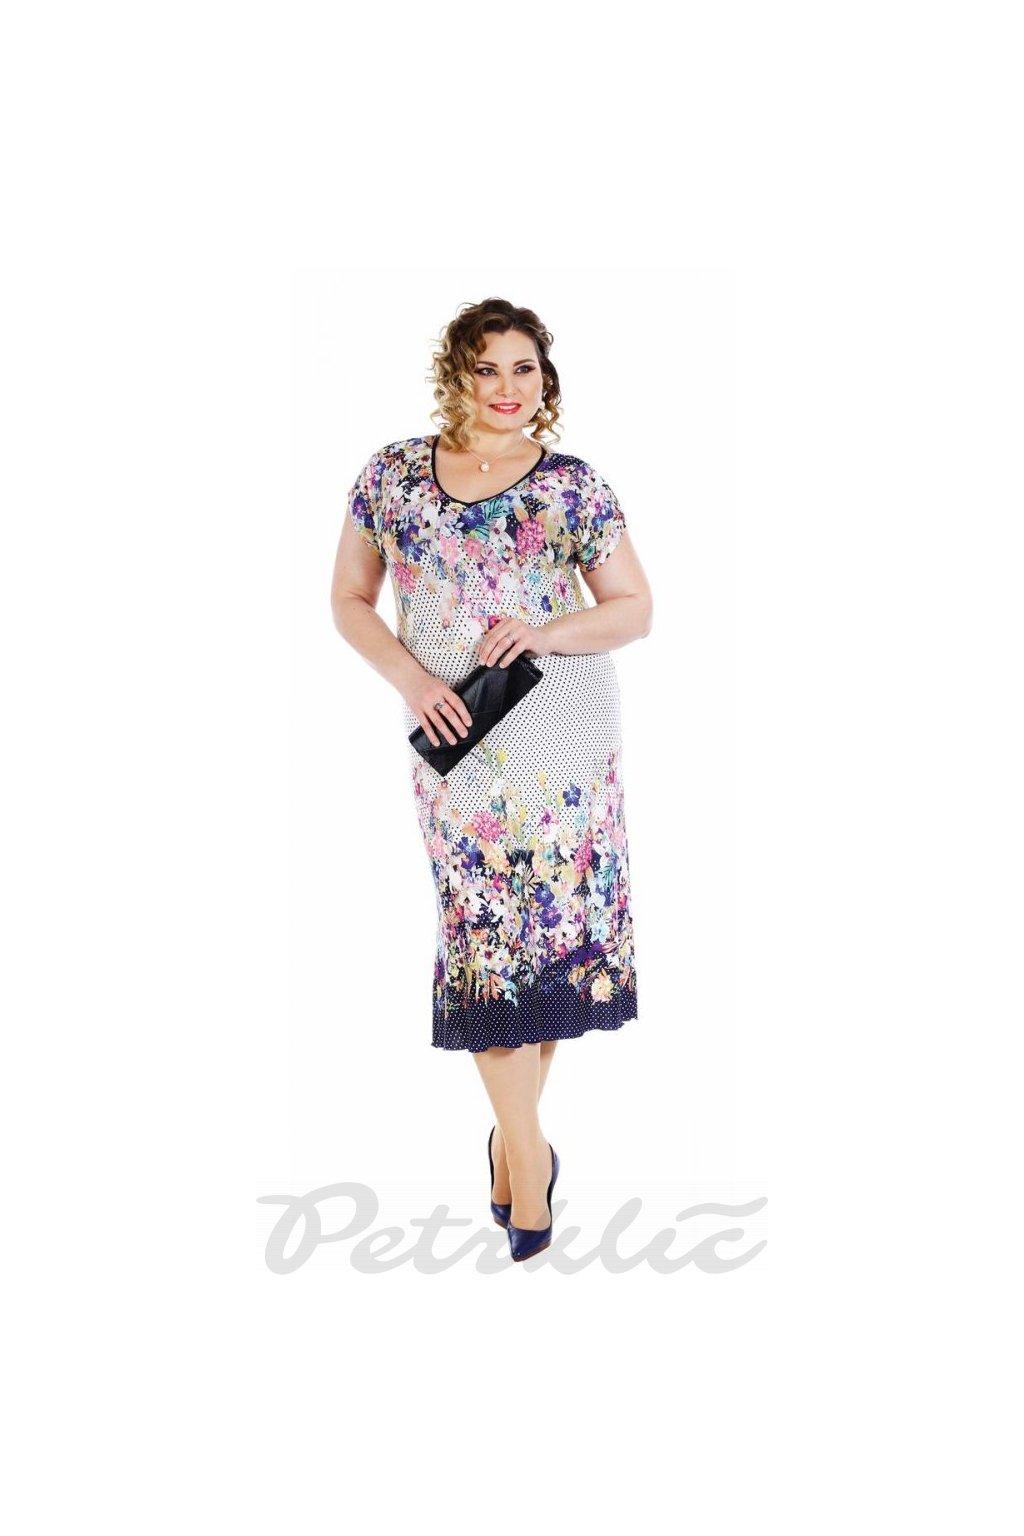 POMÁDA - šaty 115 - 120 cm + DÁREK